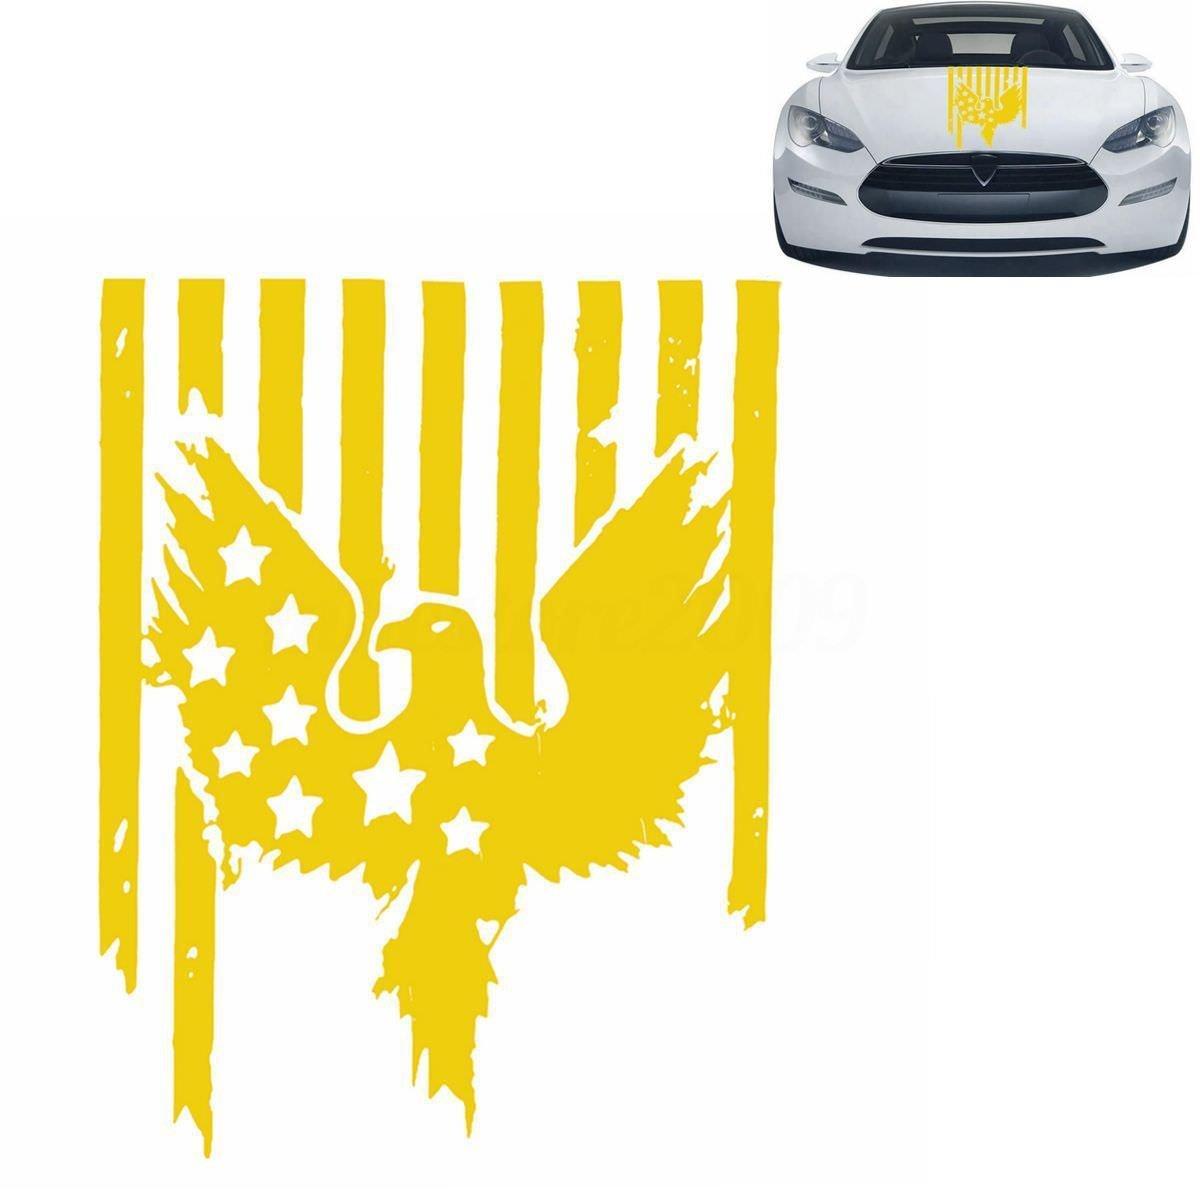 Cvanu car eagle racing hood side stripe vinyl decals stickers yellow 58 5 cmx76cm for maruti suzuki wagon r stingray amazon in car motorbike